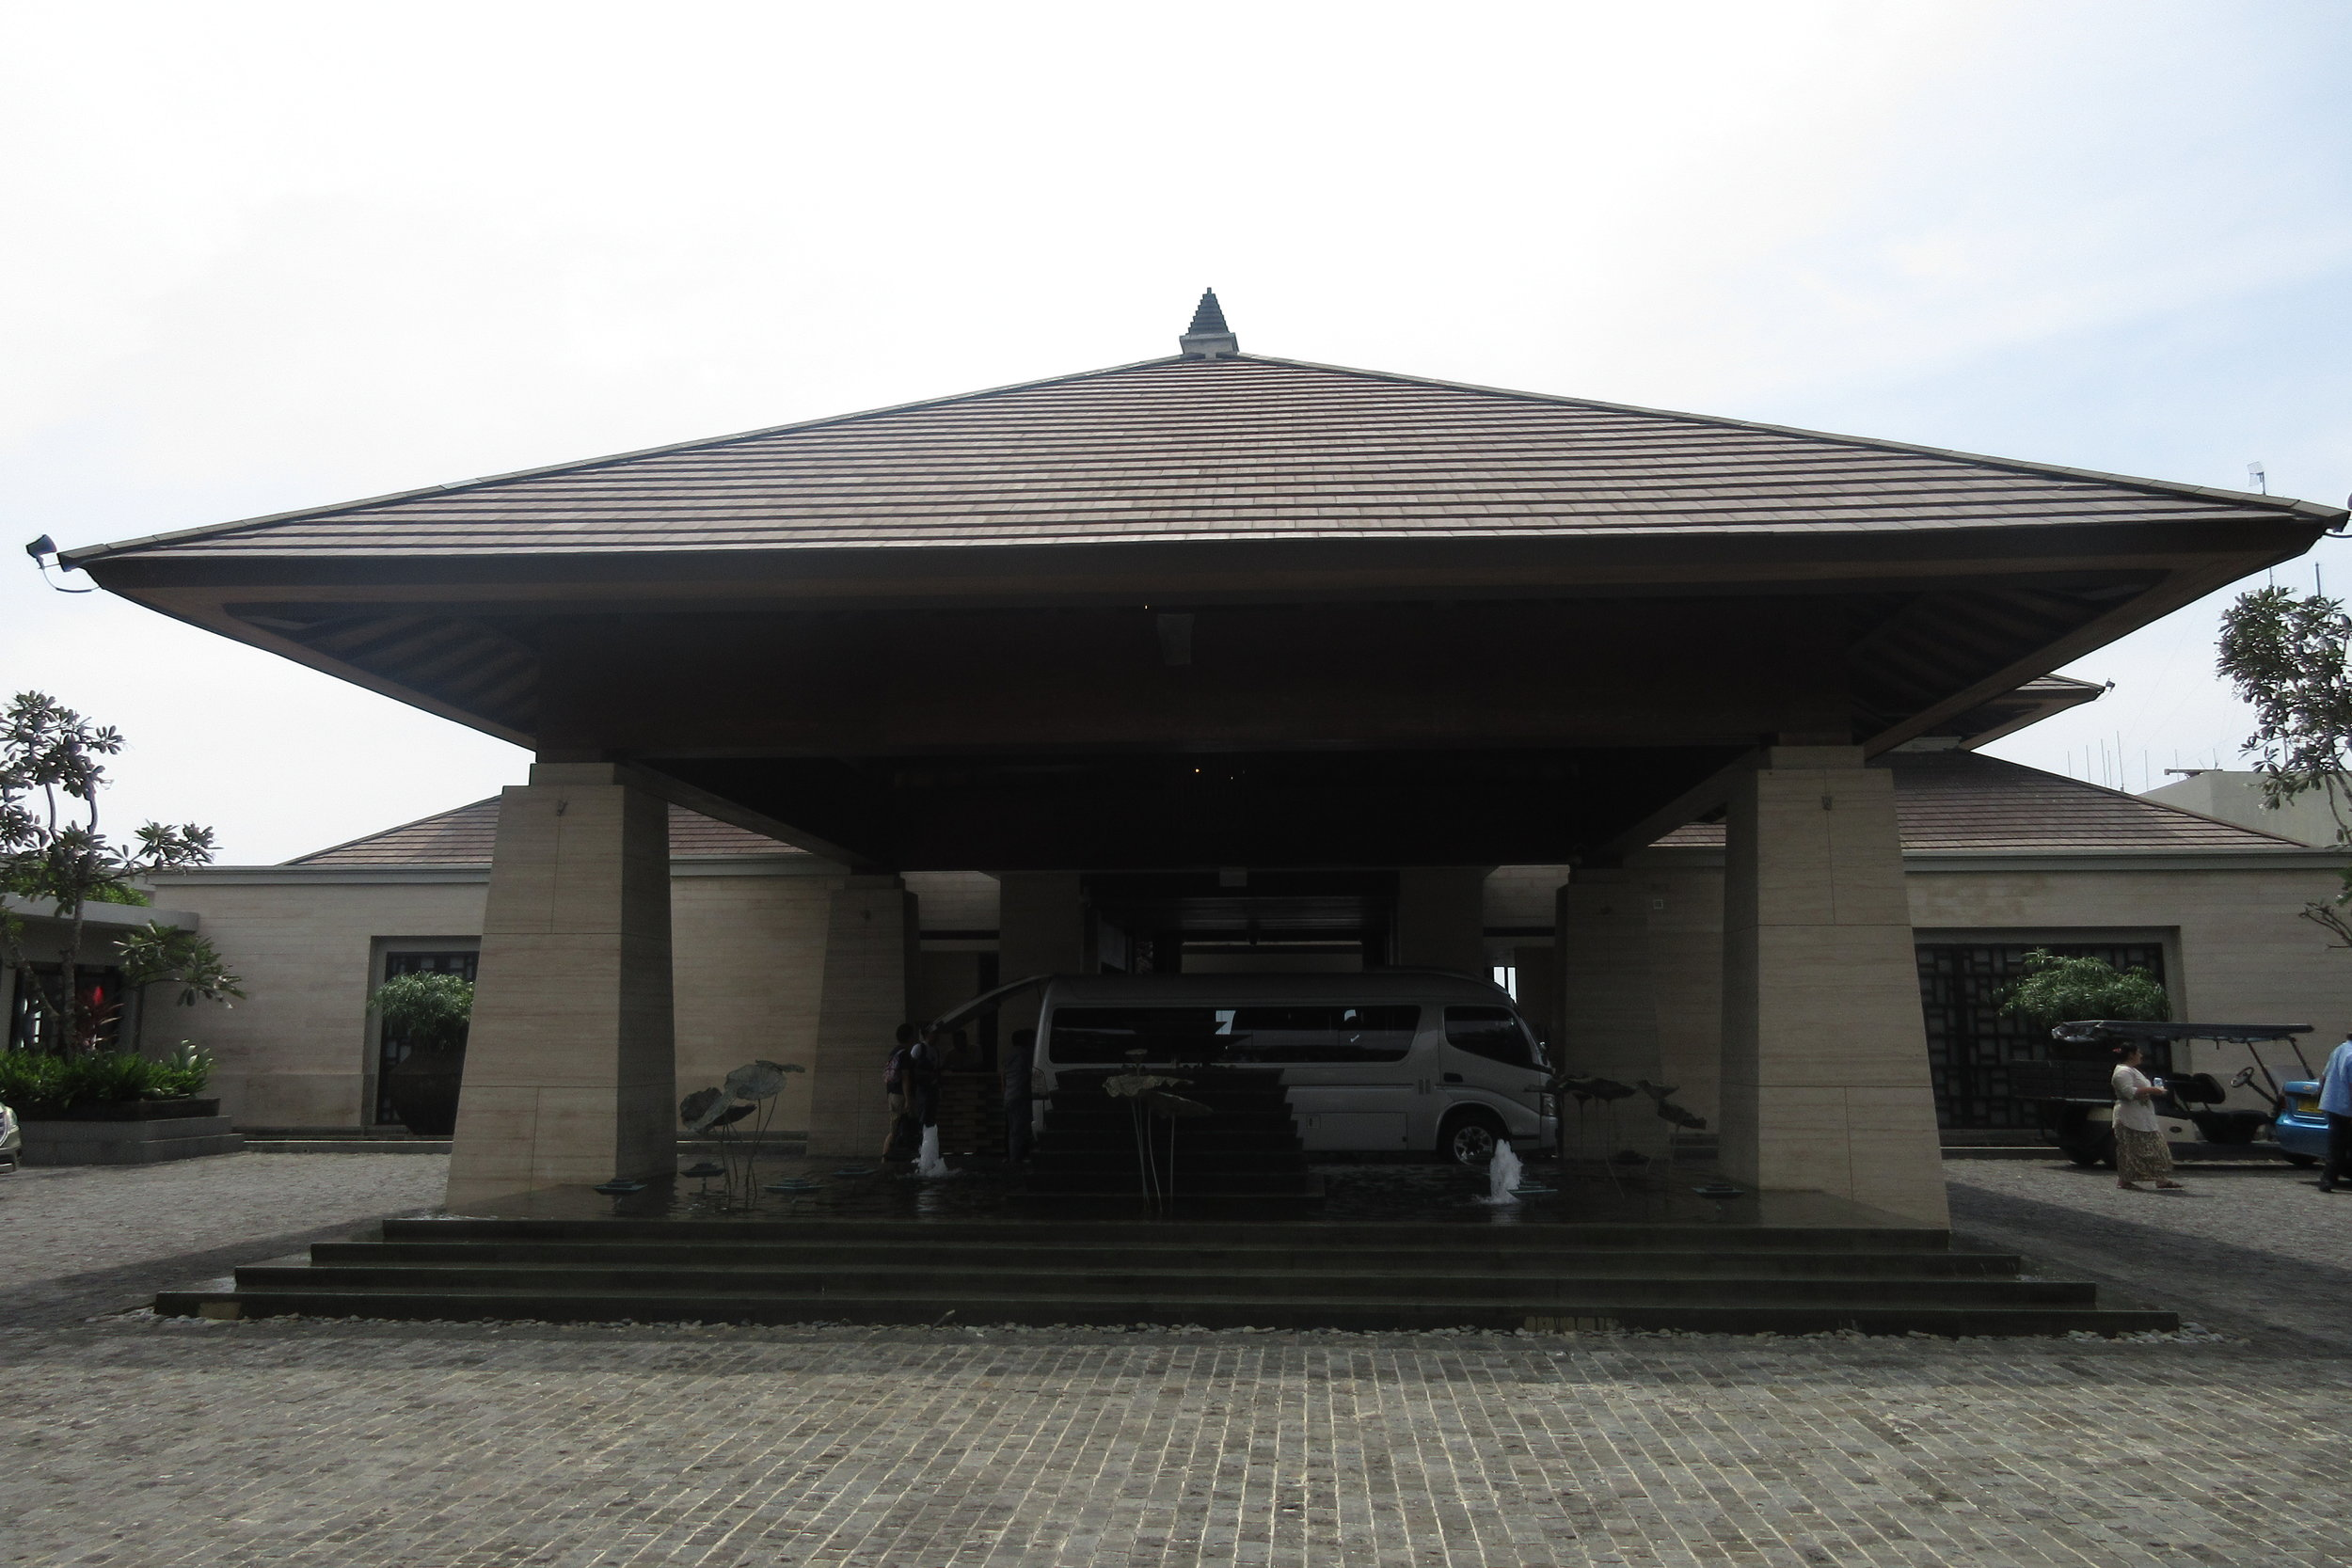 The Ritz-Carlton, Bali – Entrance